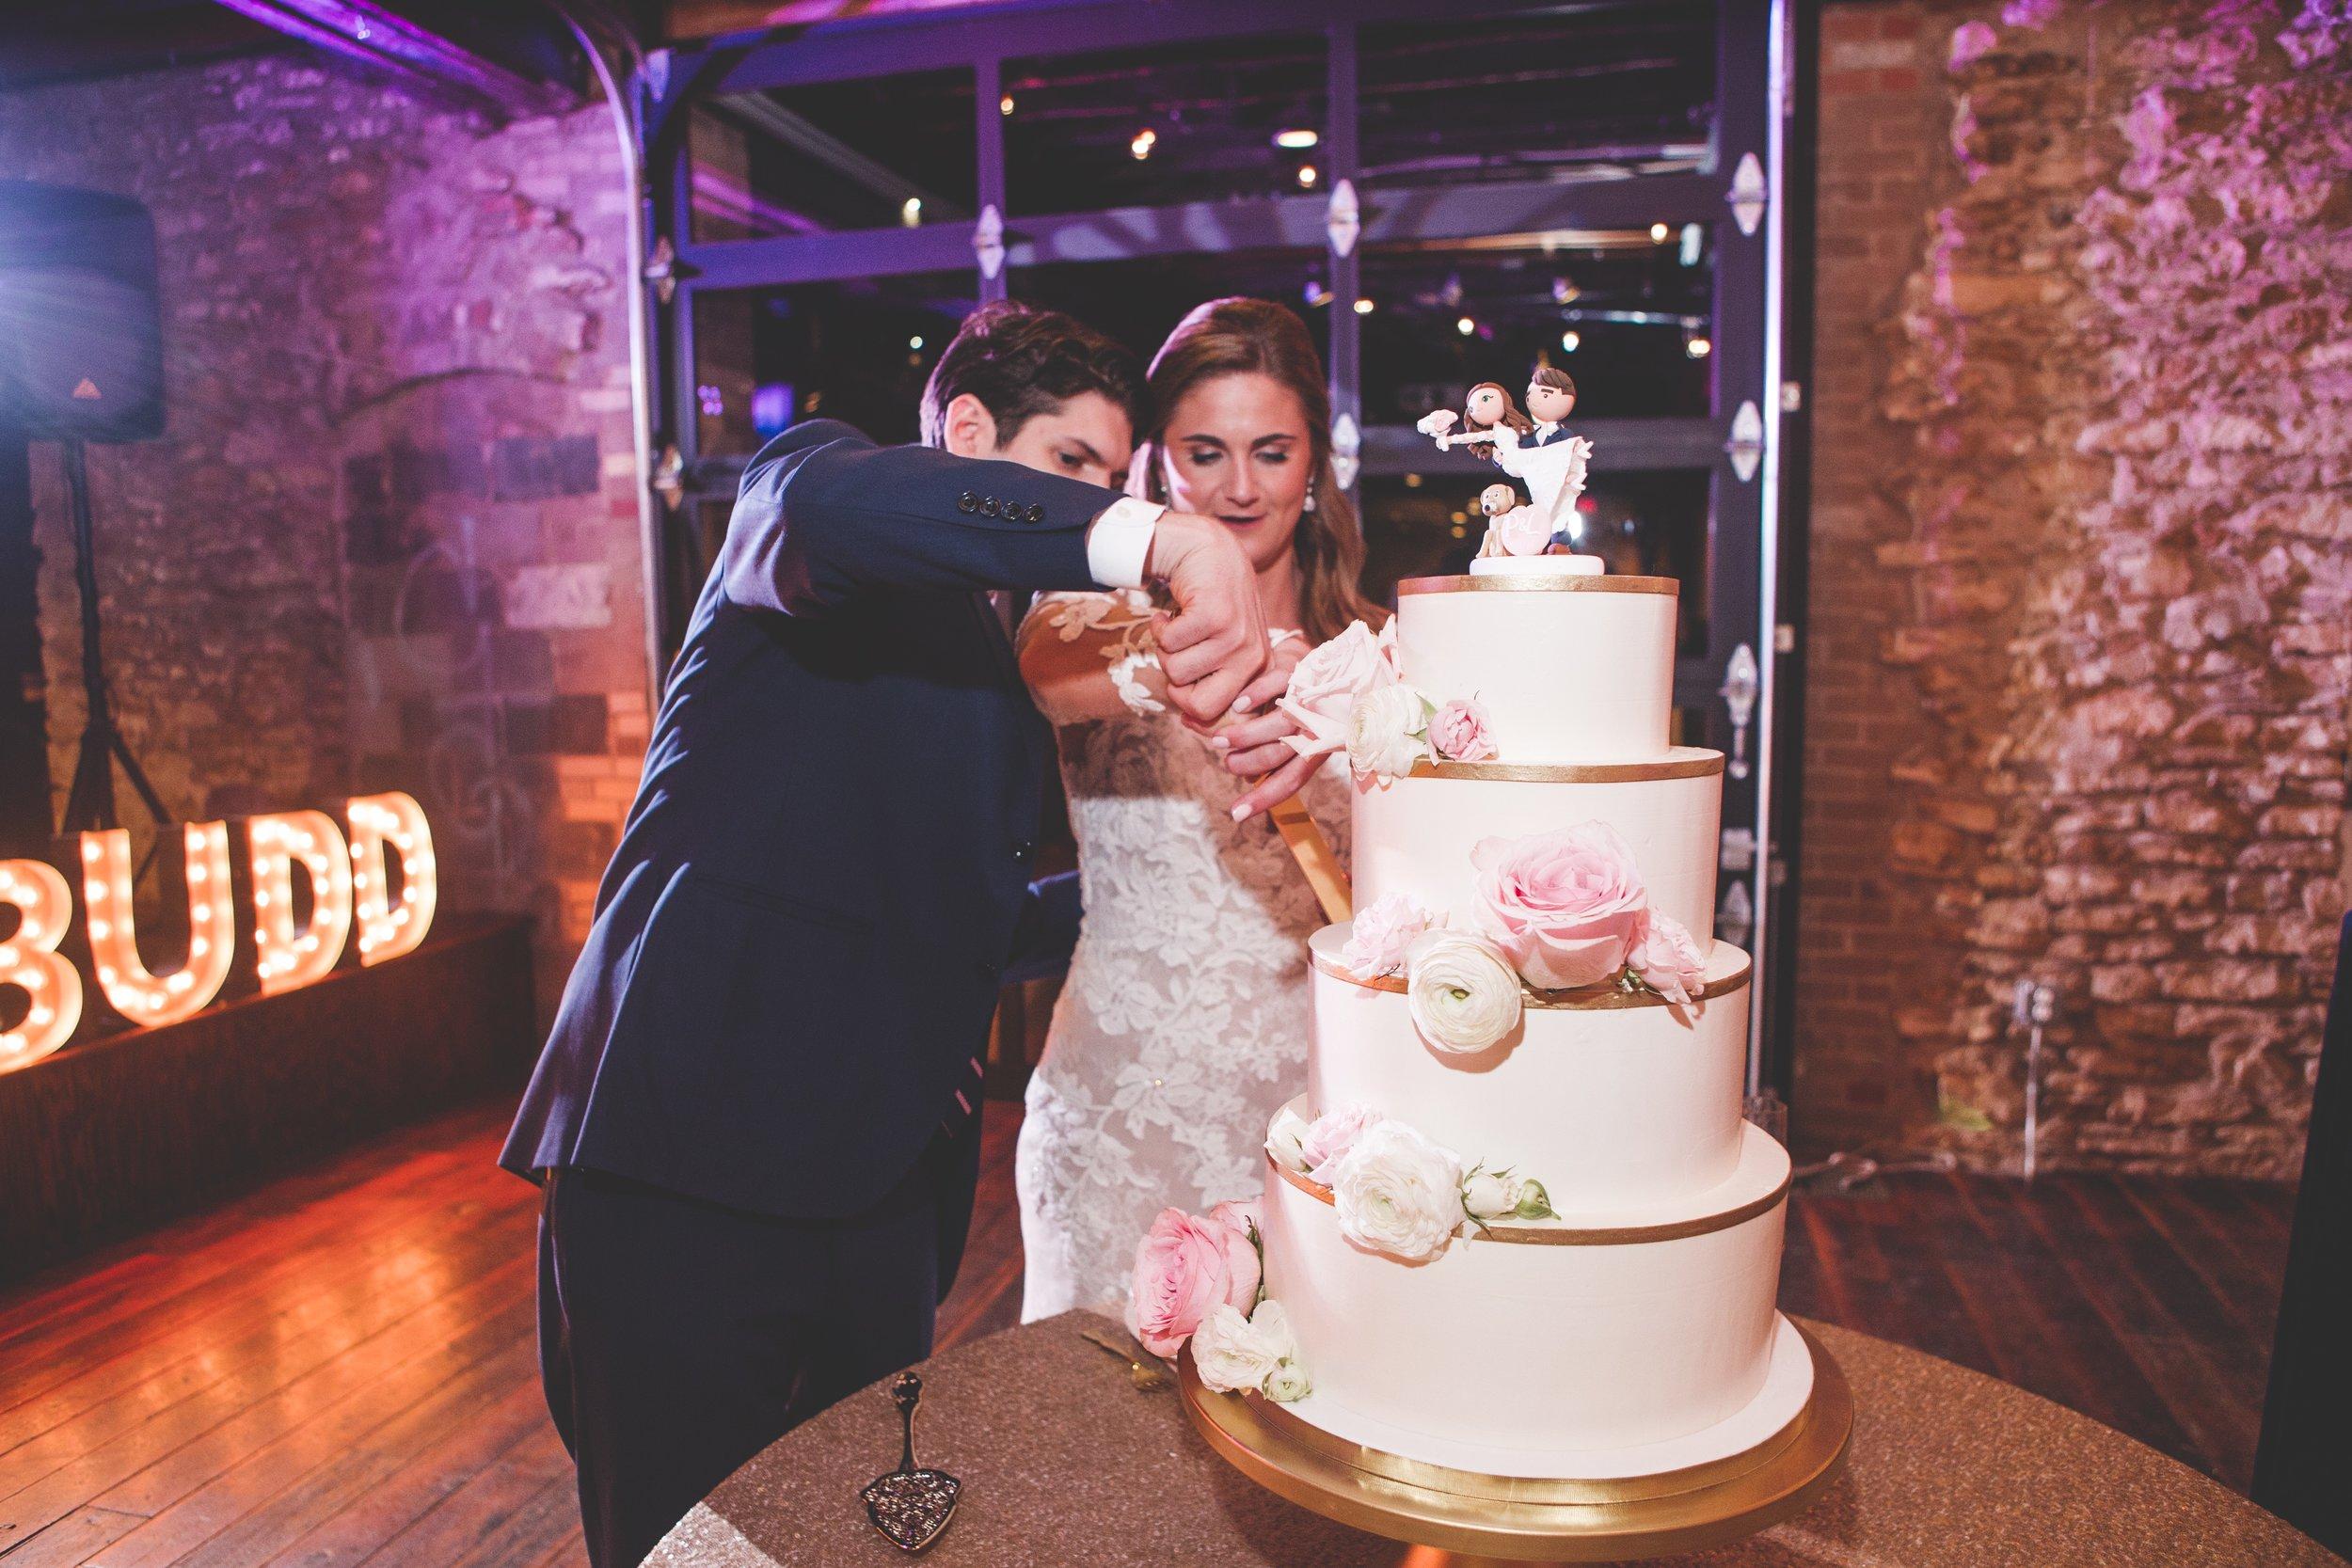 cider-gallery-lawrence-ks-wedding-photographer-jason-domingues-photography-lindsey-paul-0600.jpg